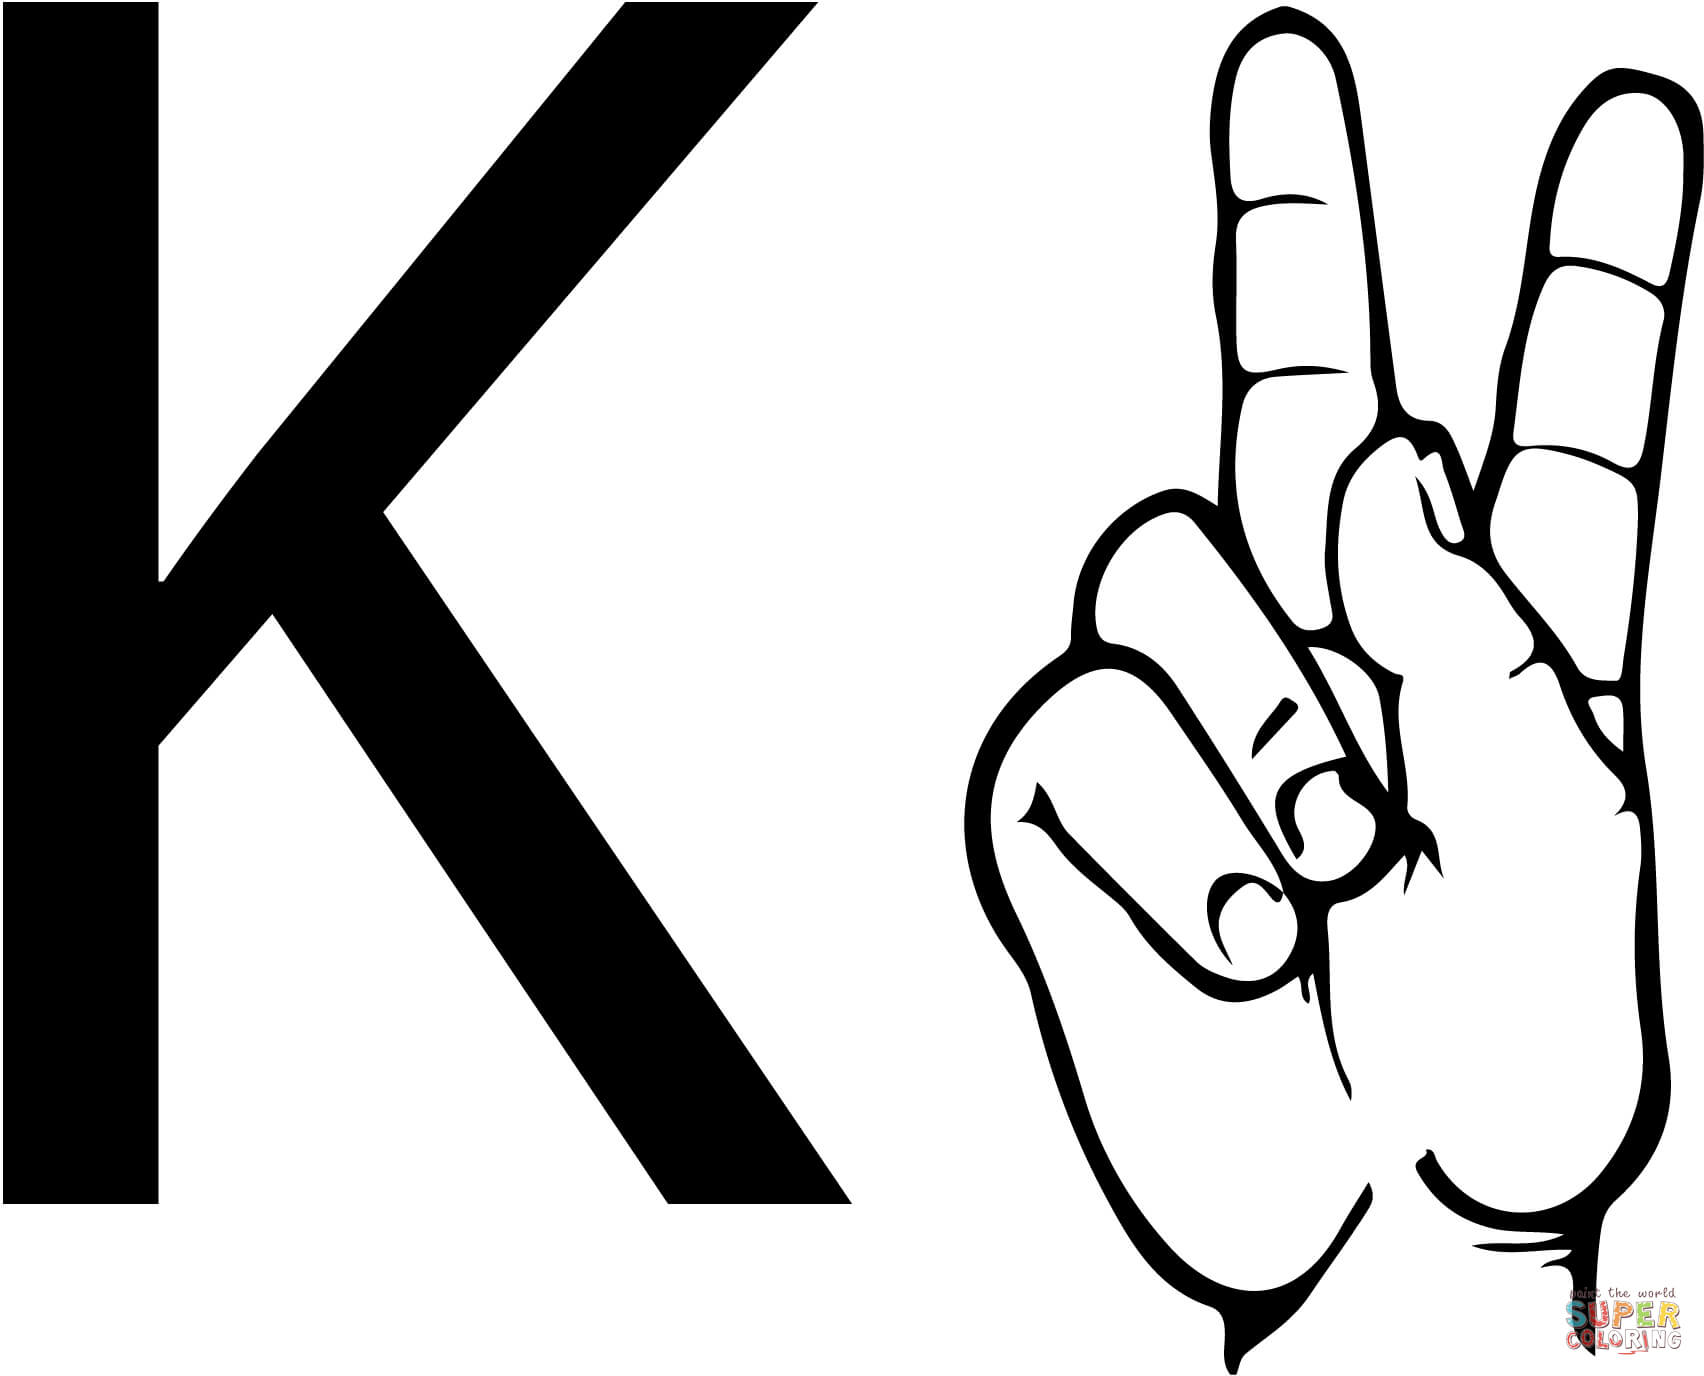 Asl Sign Language Letter K Coloring Page